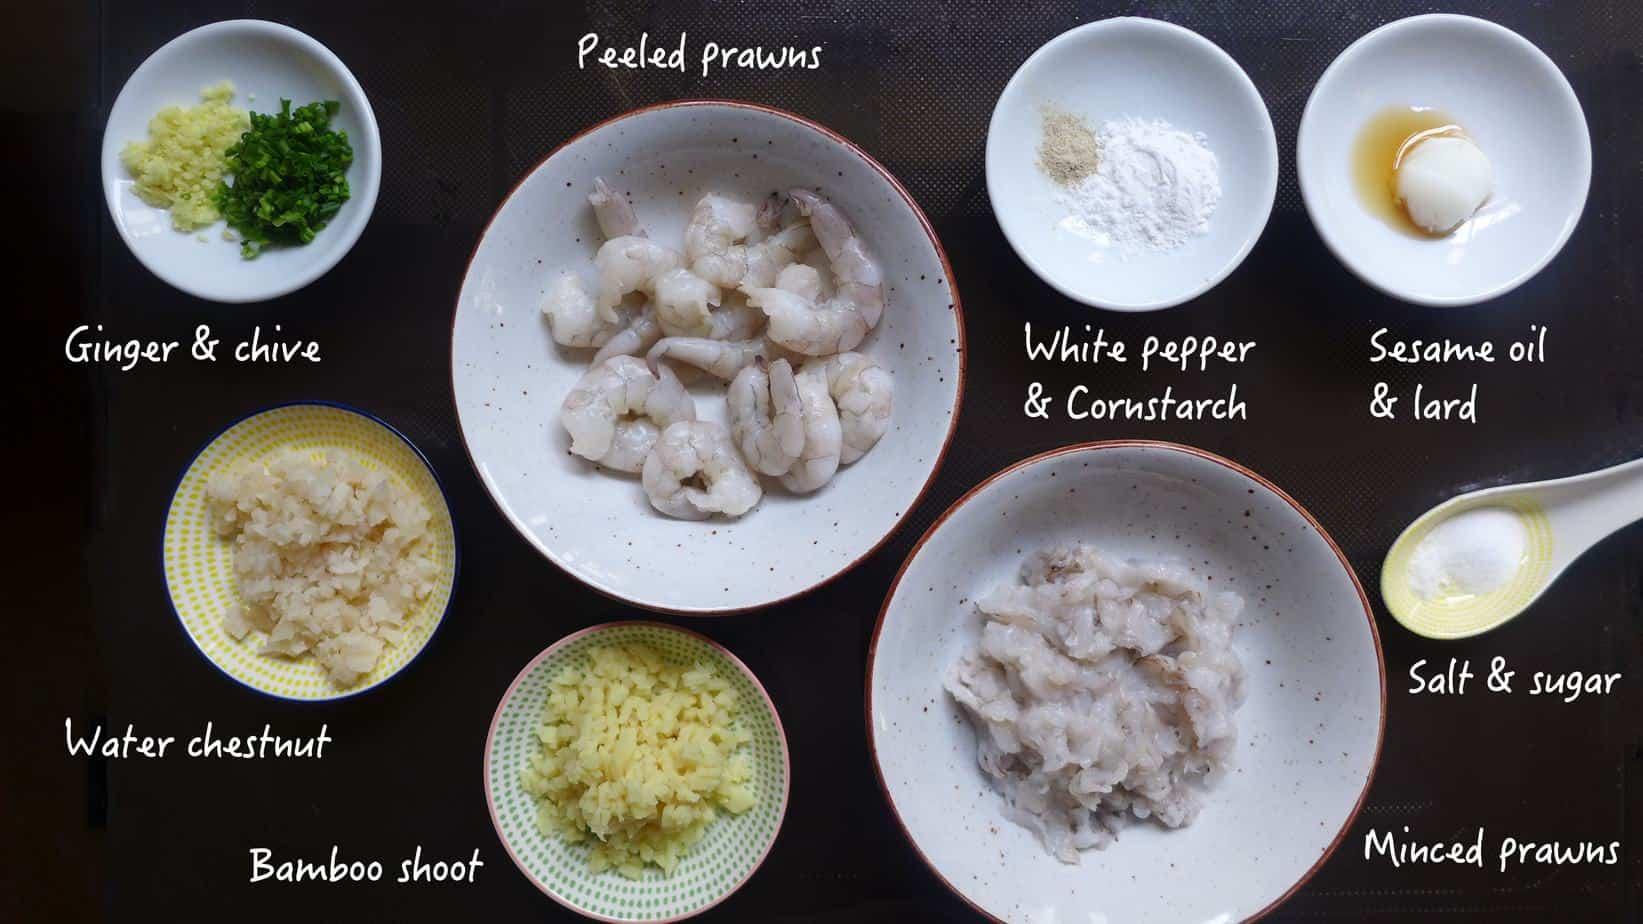 Ingredients for making Har Gow, crystal shrimp dumplings